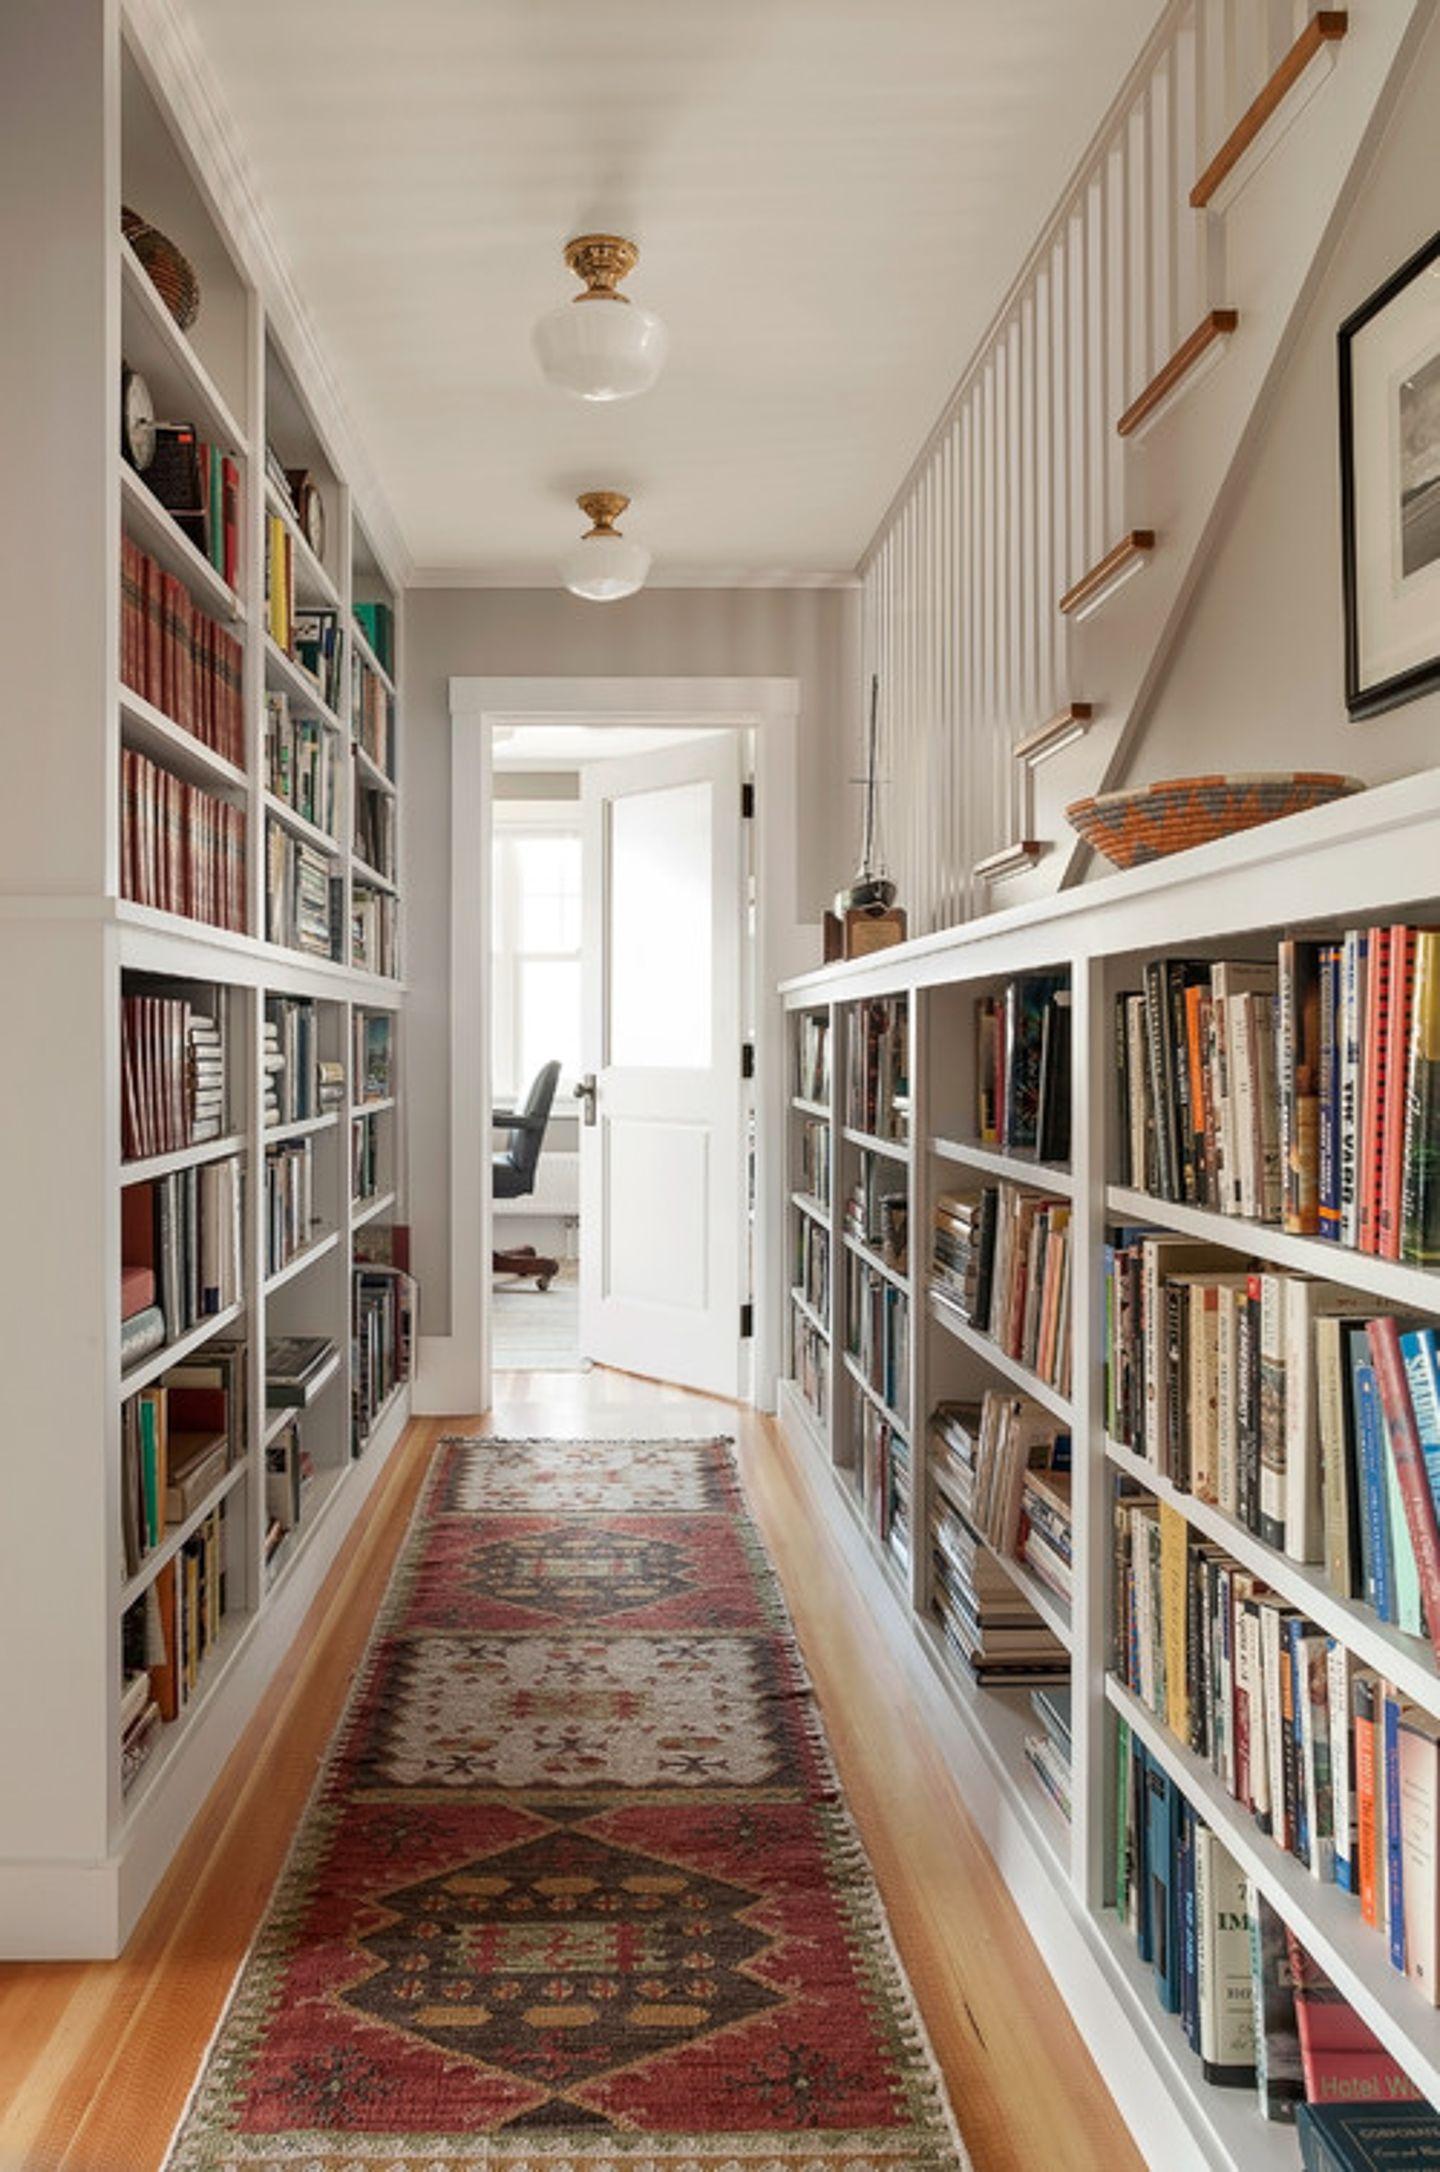 Photo of Cozy Reading Room Ideas: 15 Creative Small Home Library Design Ideas